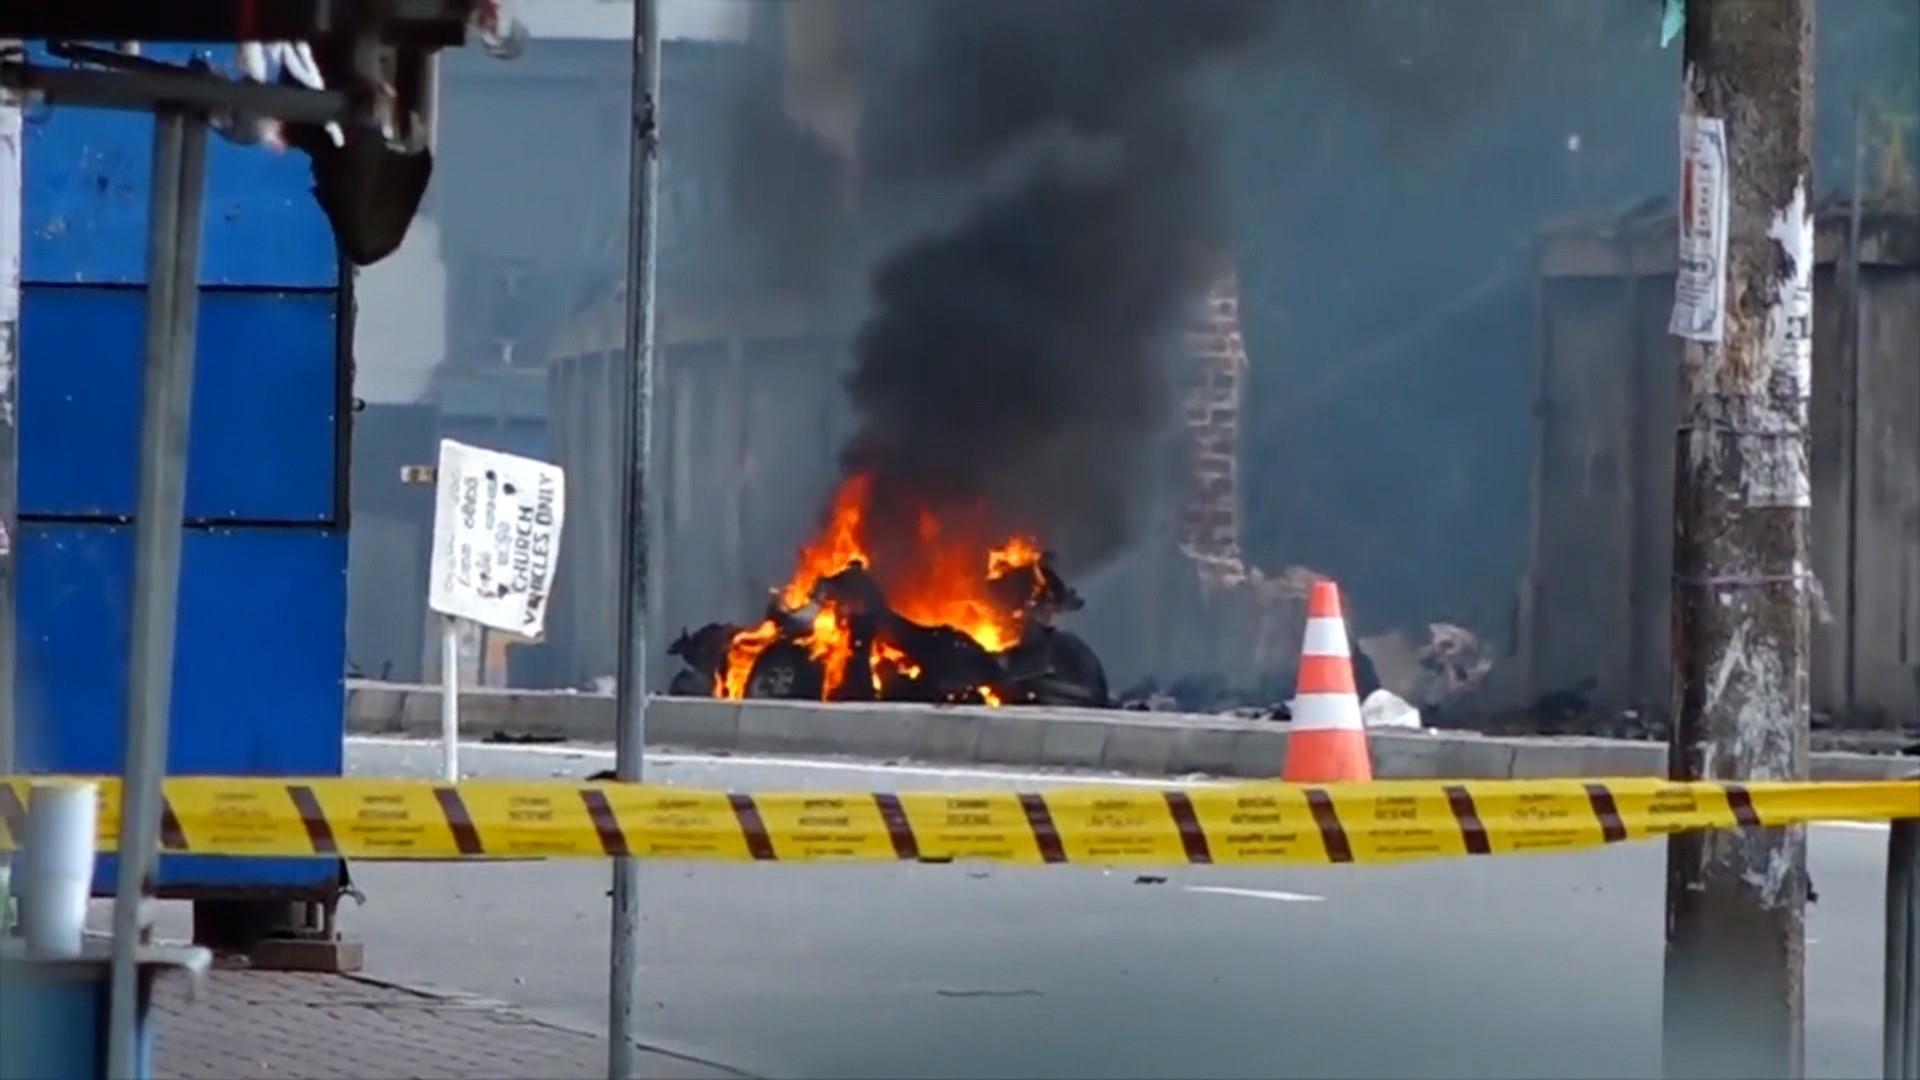 Sri Lanka bombings were retaliation for Christchurch shooting, defense minister says